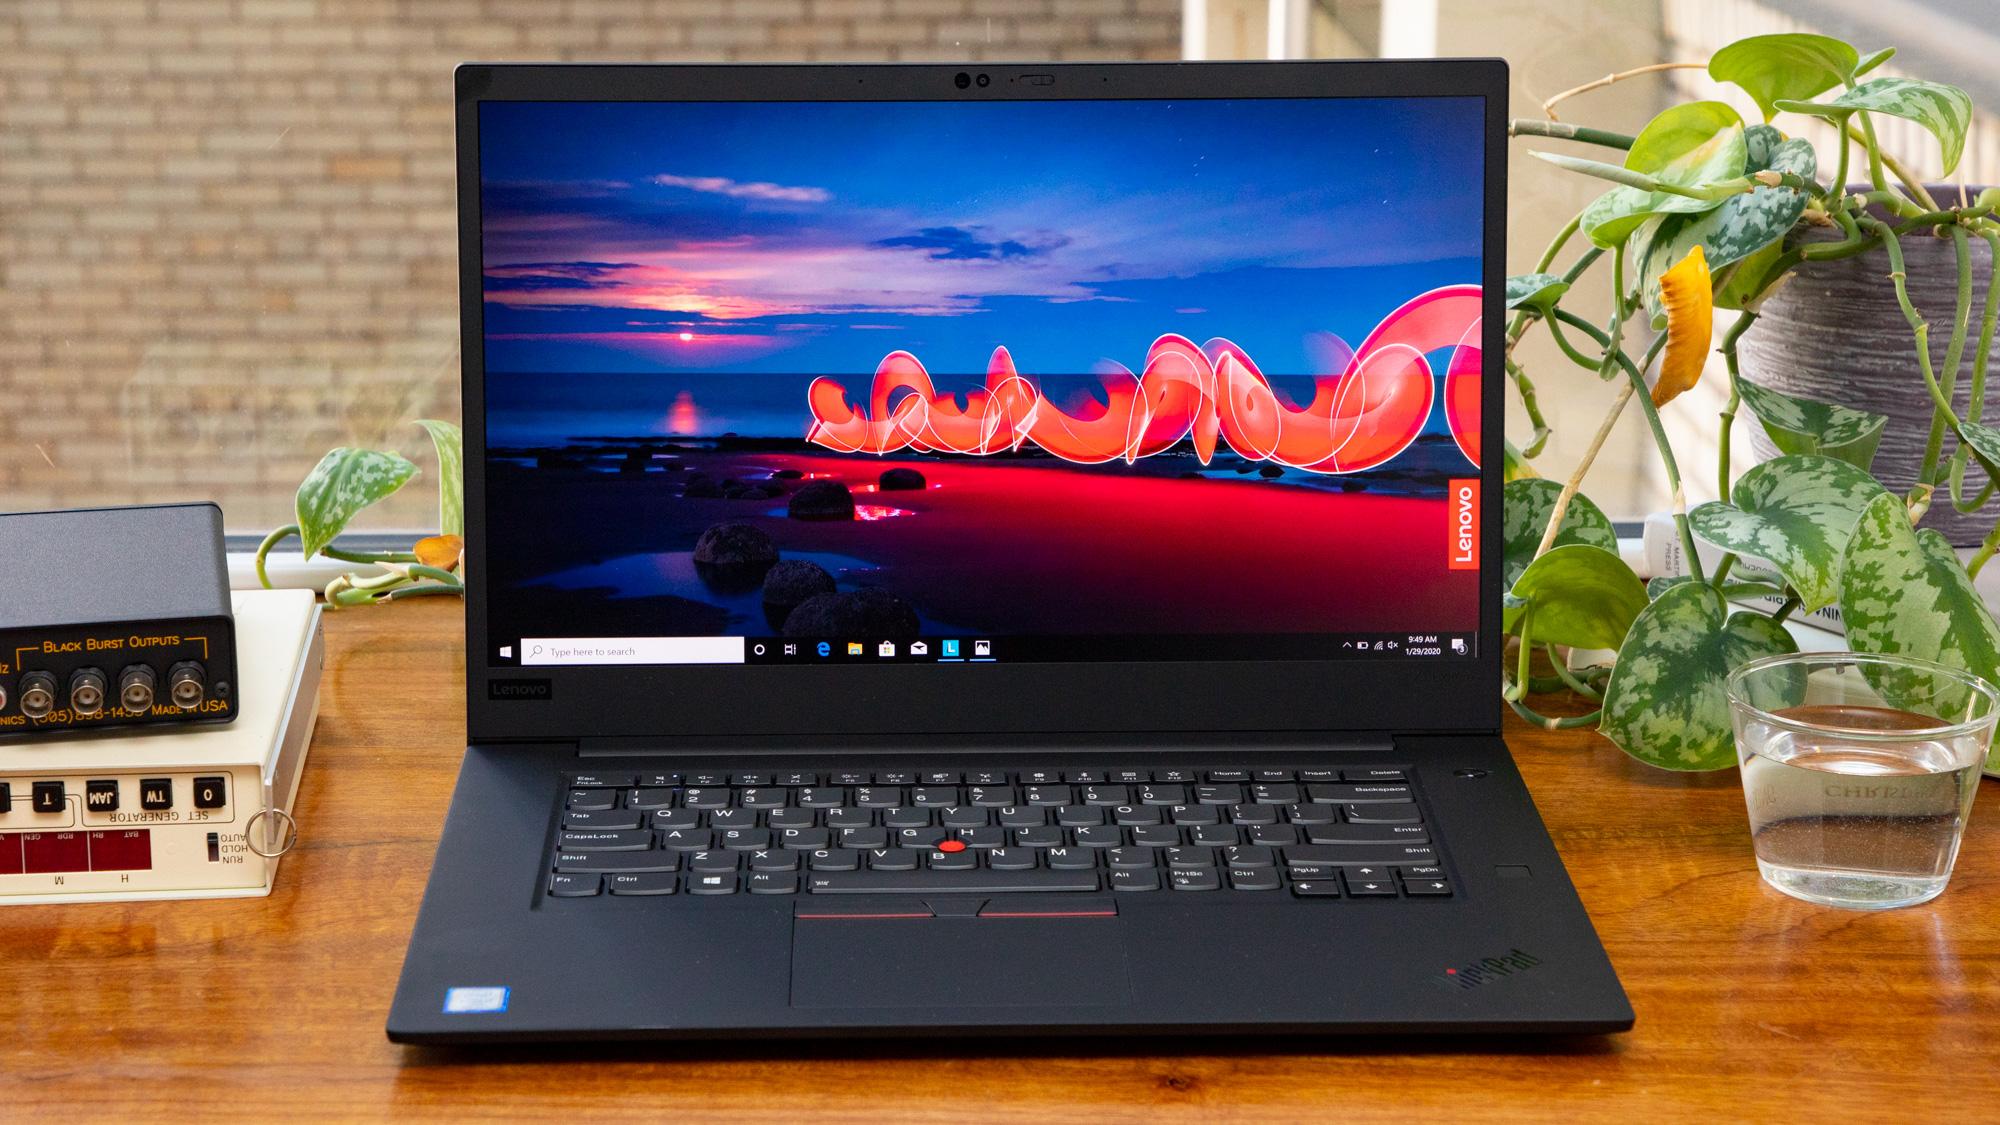 Lenovo ThinkPad X1 Extreme (2nd Gen) - 15.6